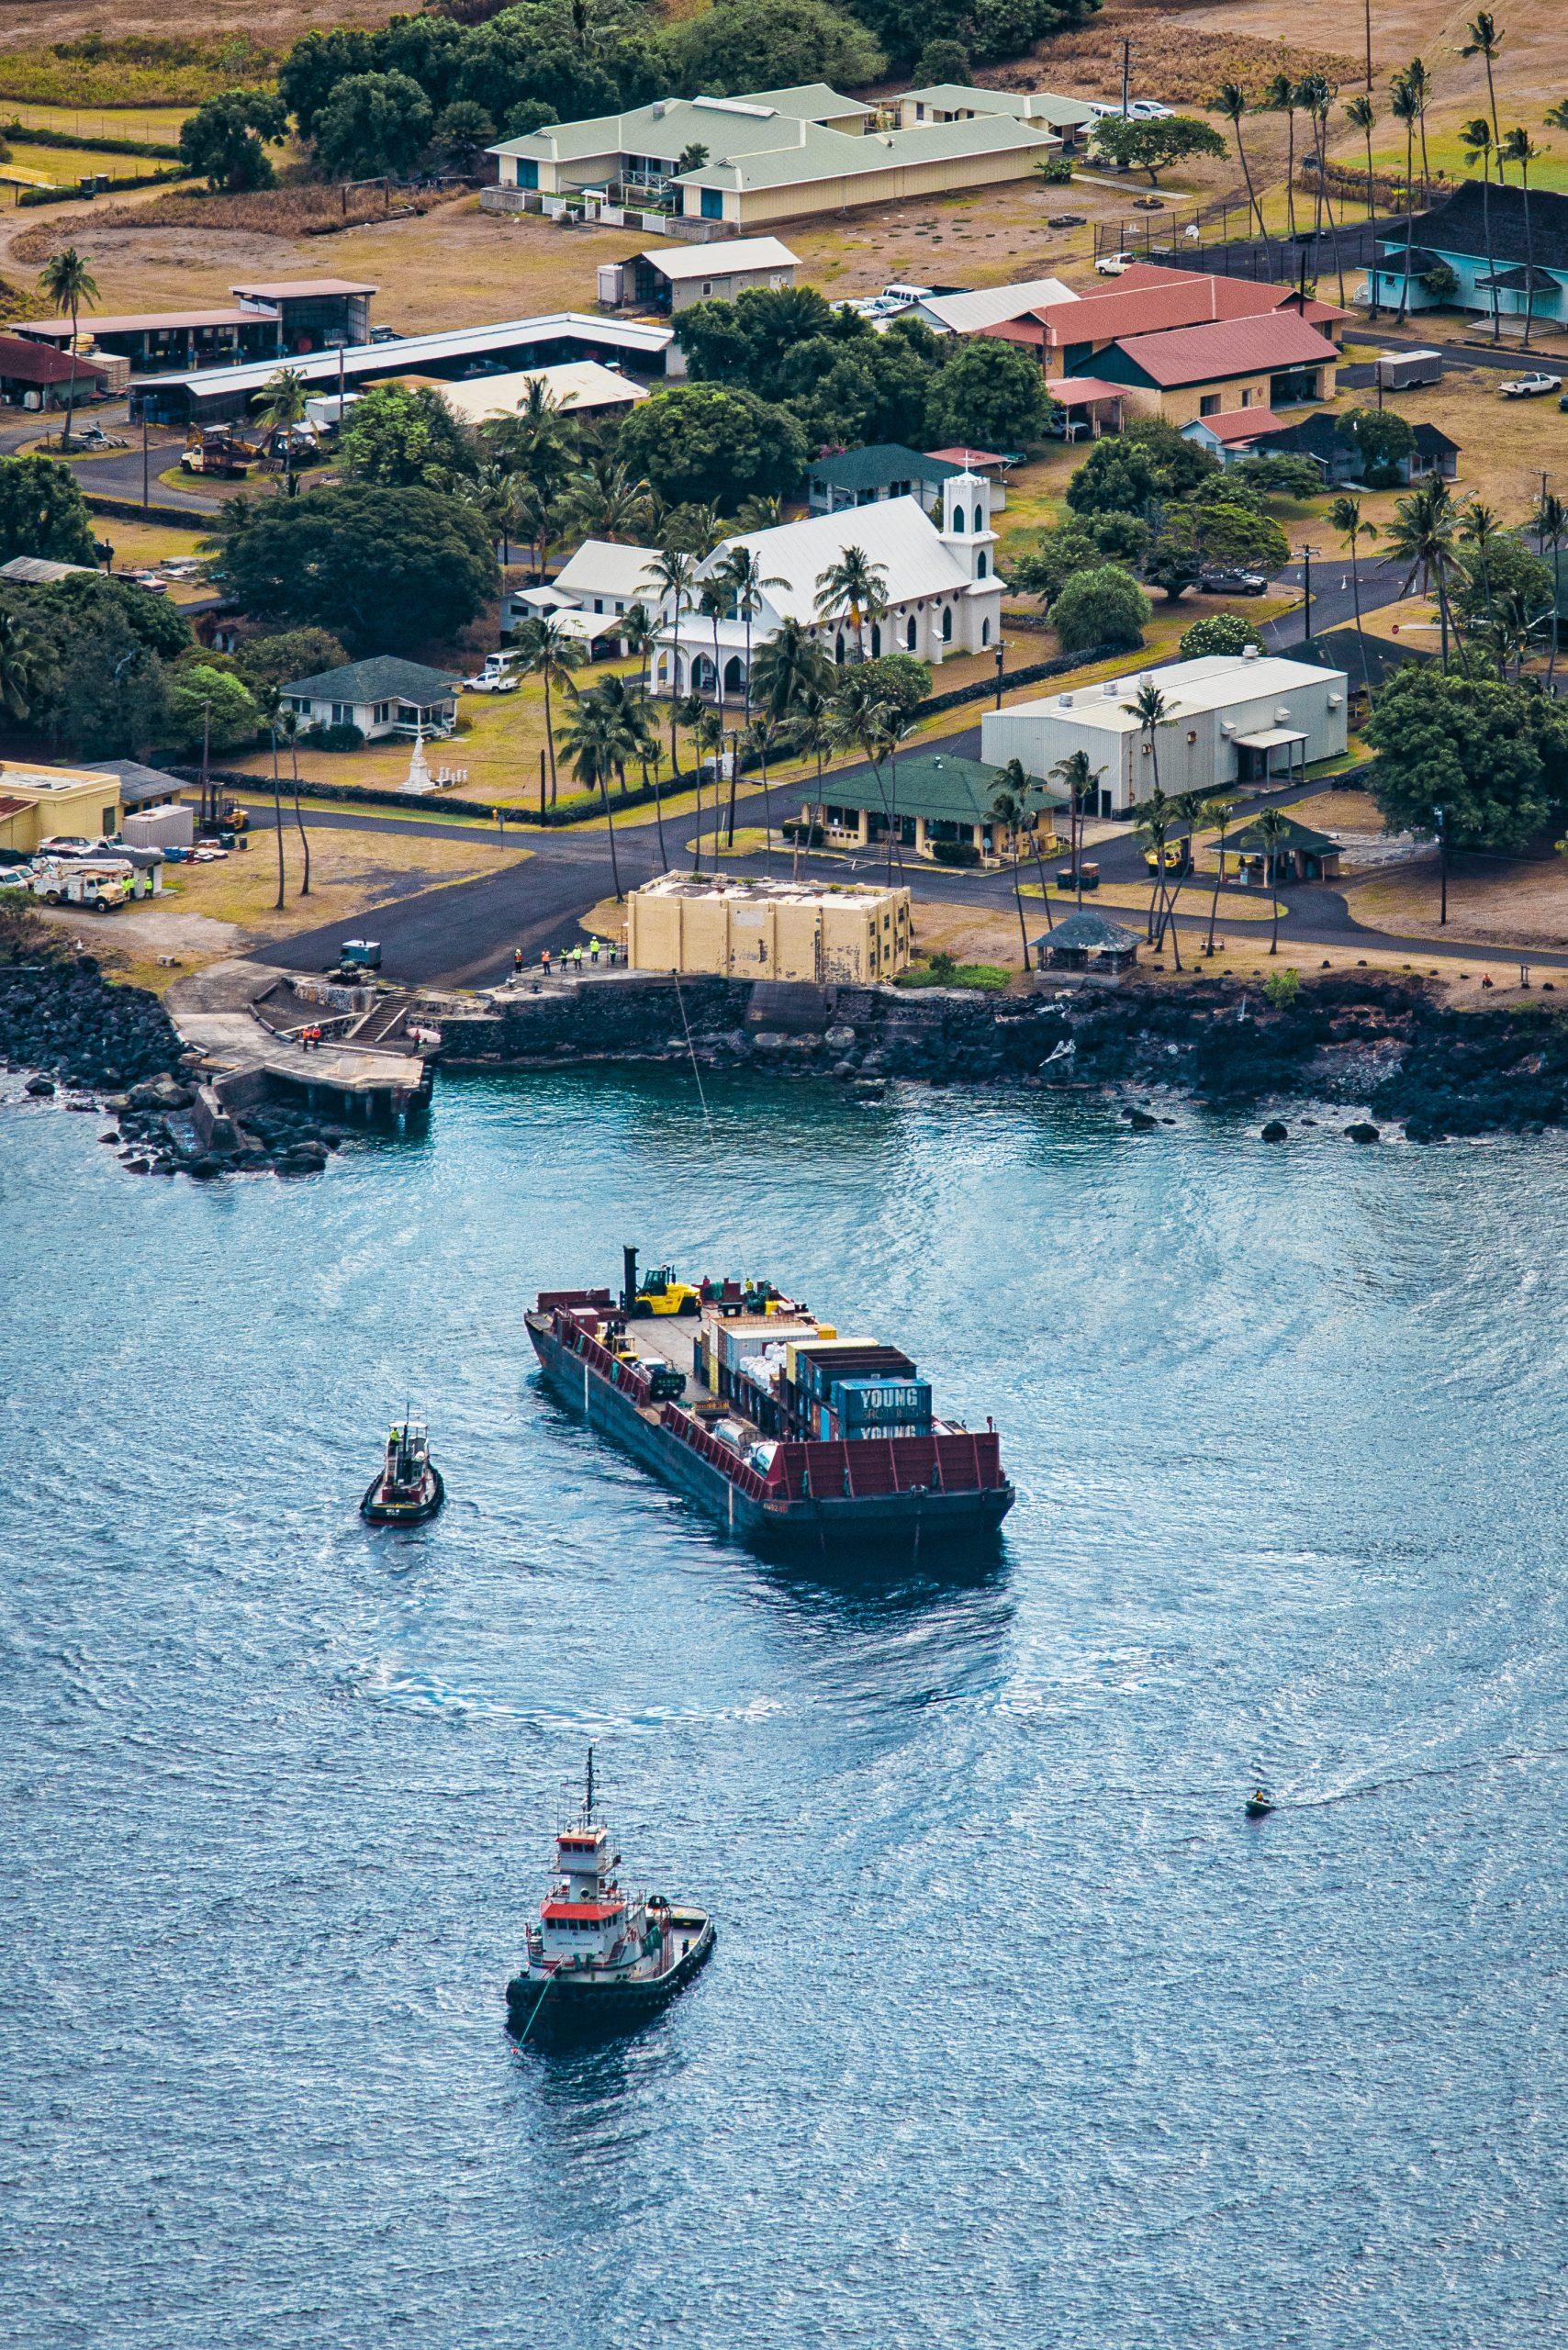 Kalaupapa's Annual Barge